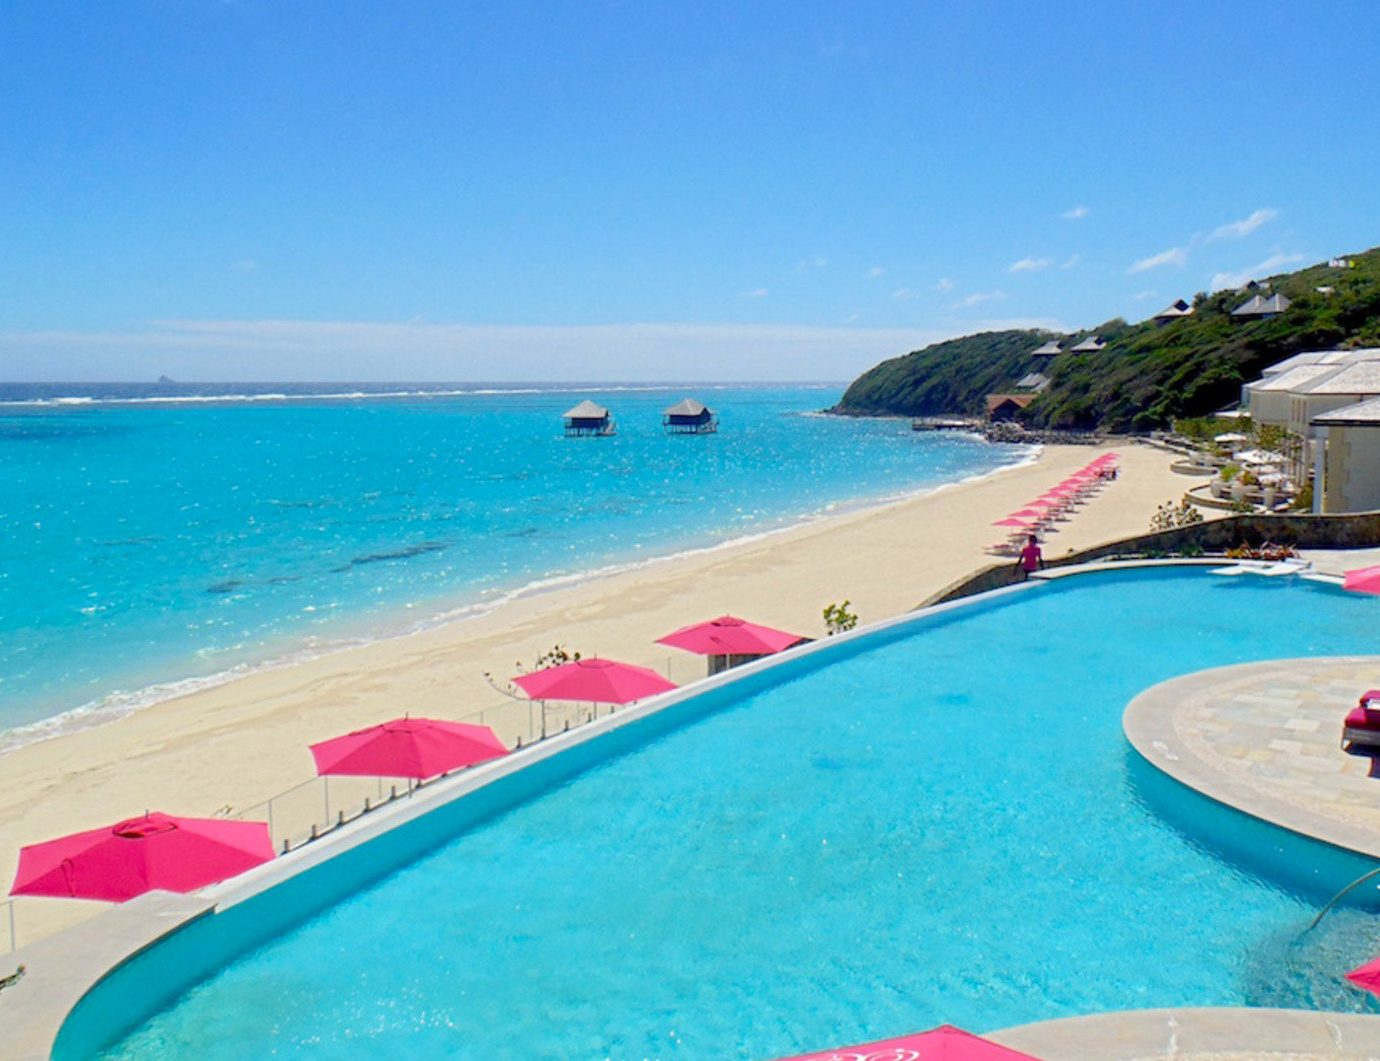 sky water swimming pool leisure Beach caribbean Resort Sea resort town Lagoon reef lined swimming shore